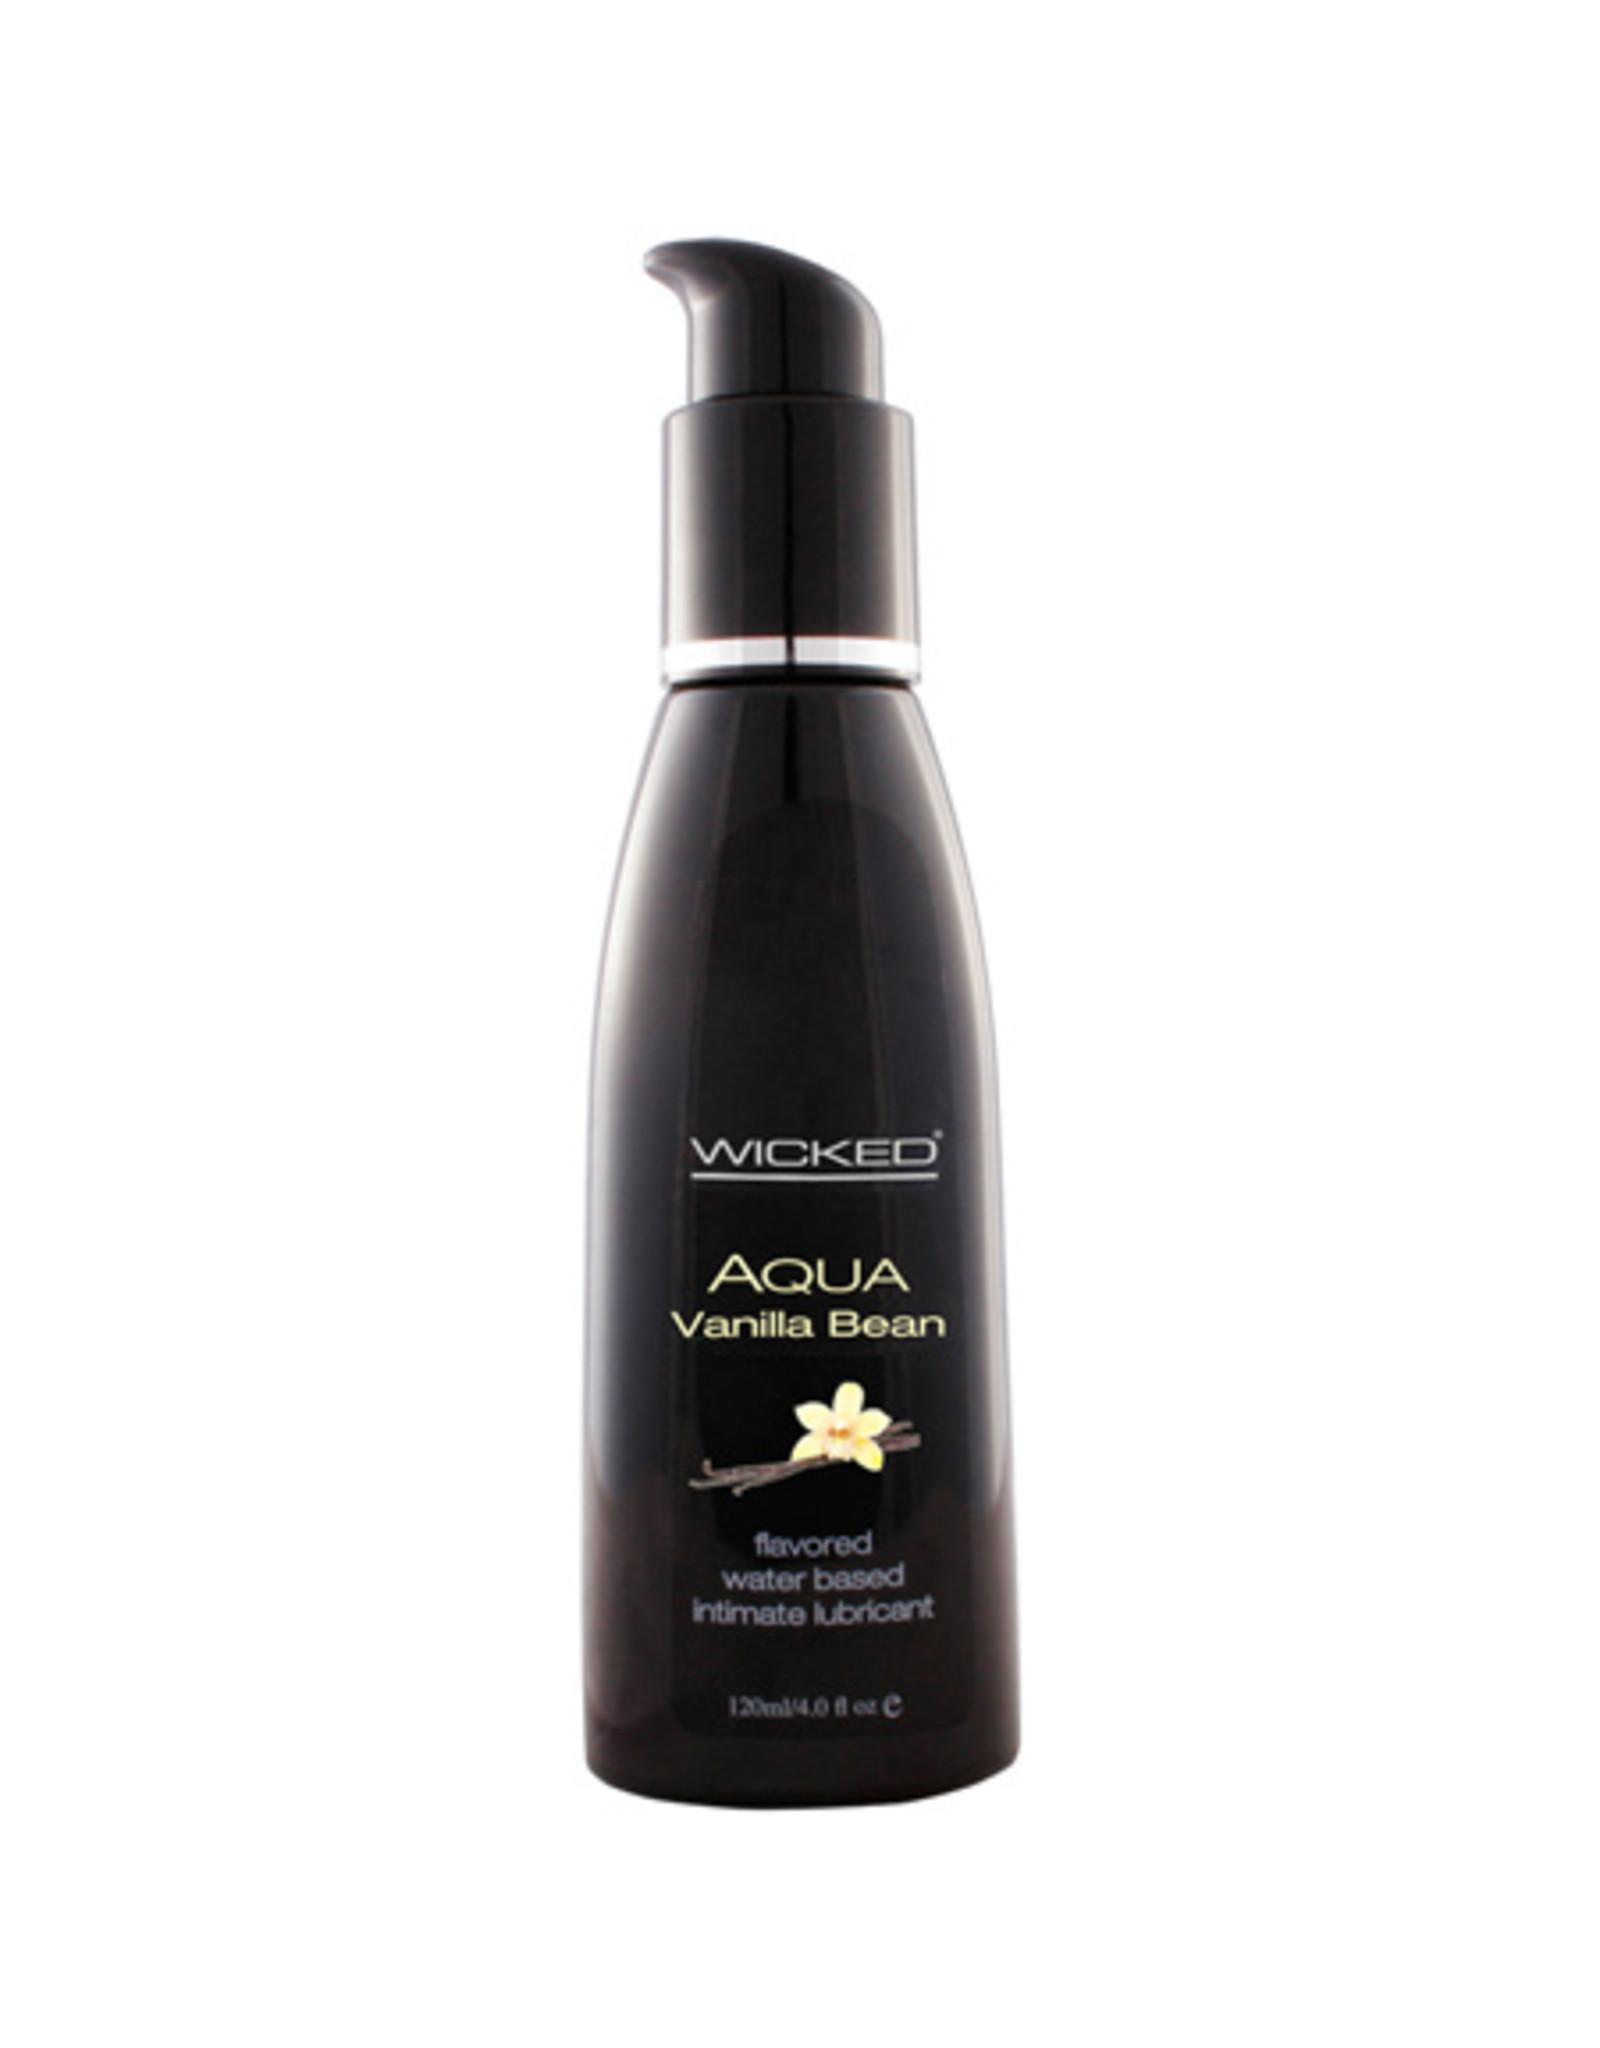 Wicked Sensual Care Aqua Water Based Lubricant - 2 oz Vanilla Bean